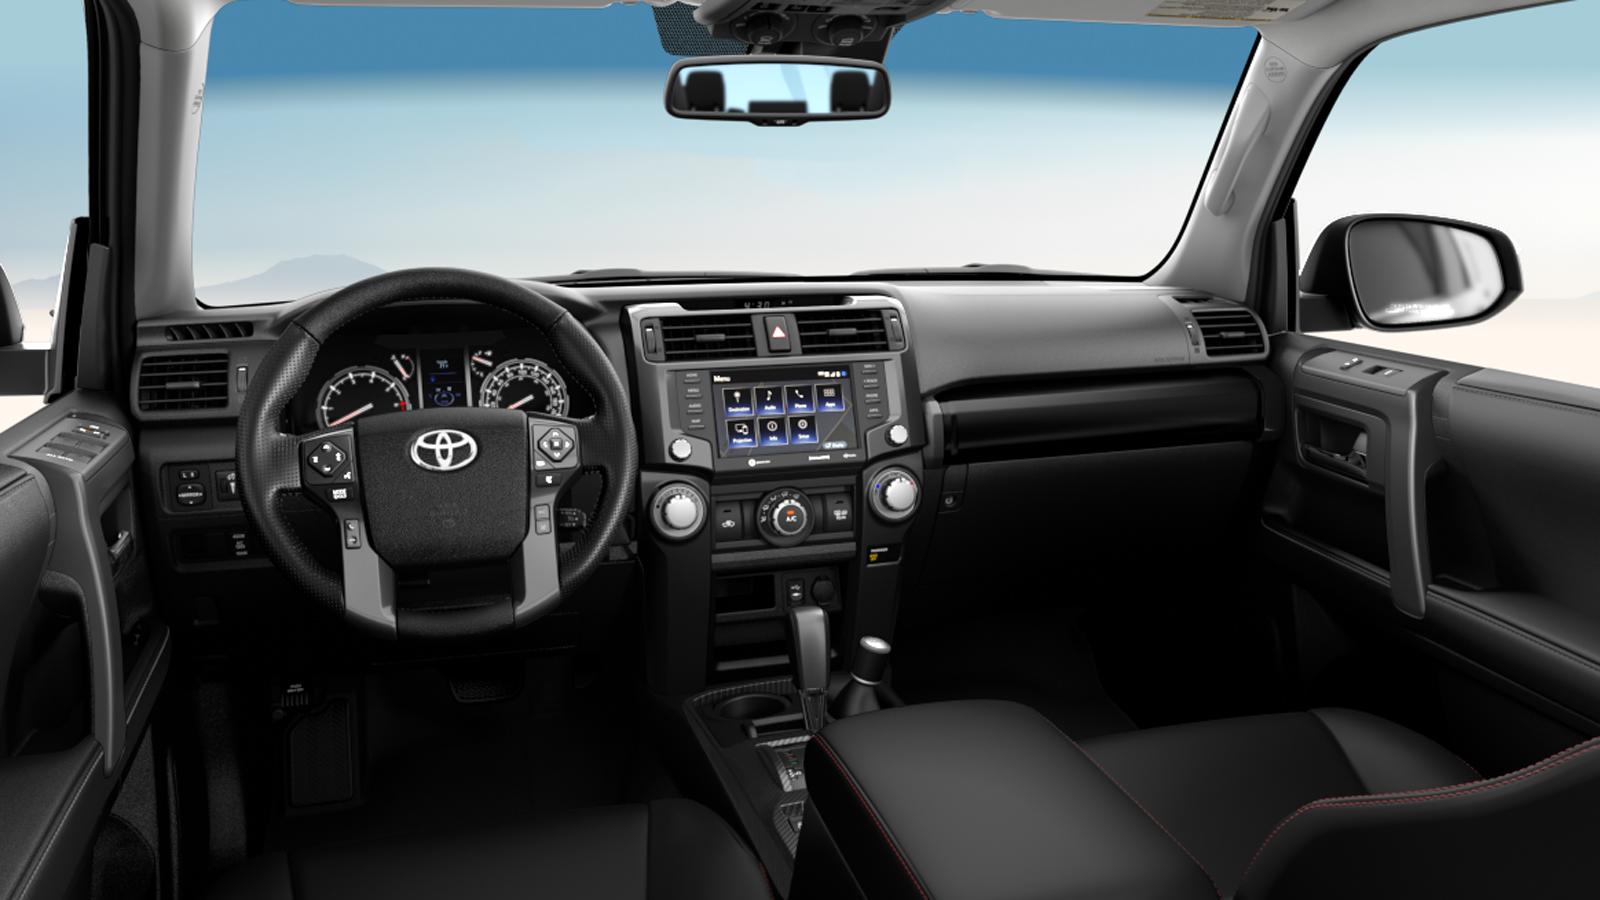 2021 Toyota 4runner Interior Photo Gallery Autoblog